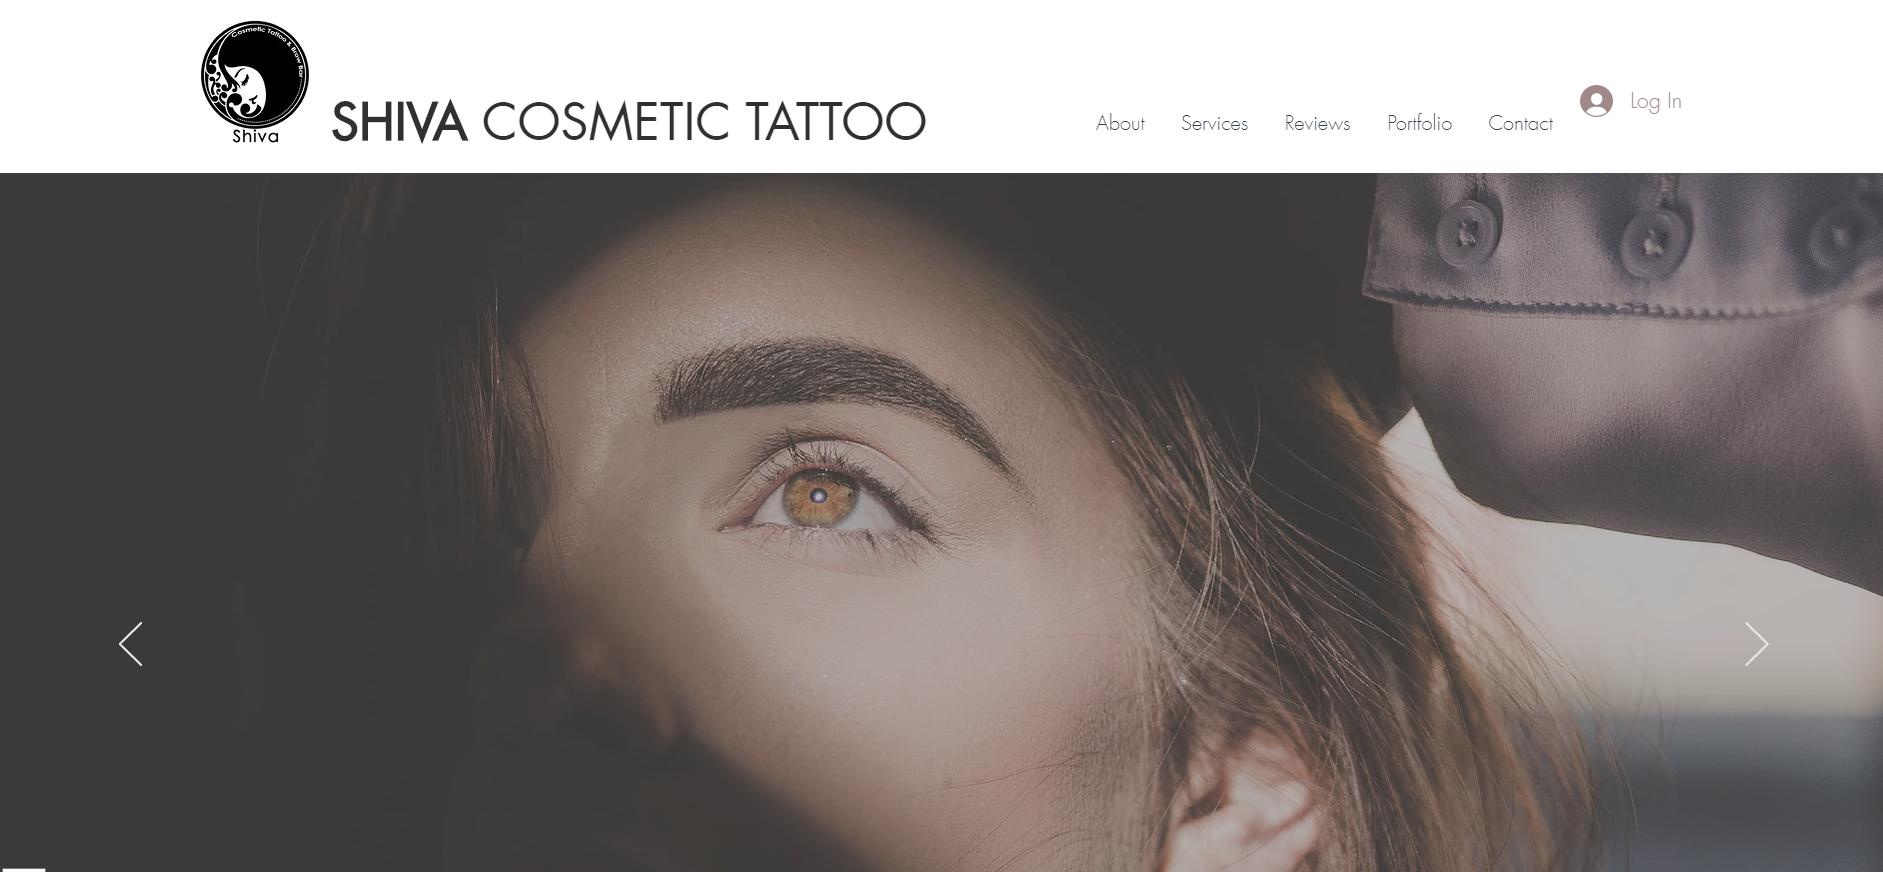 Shiva Cosmetic Tattoo